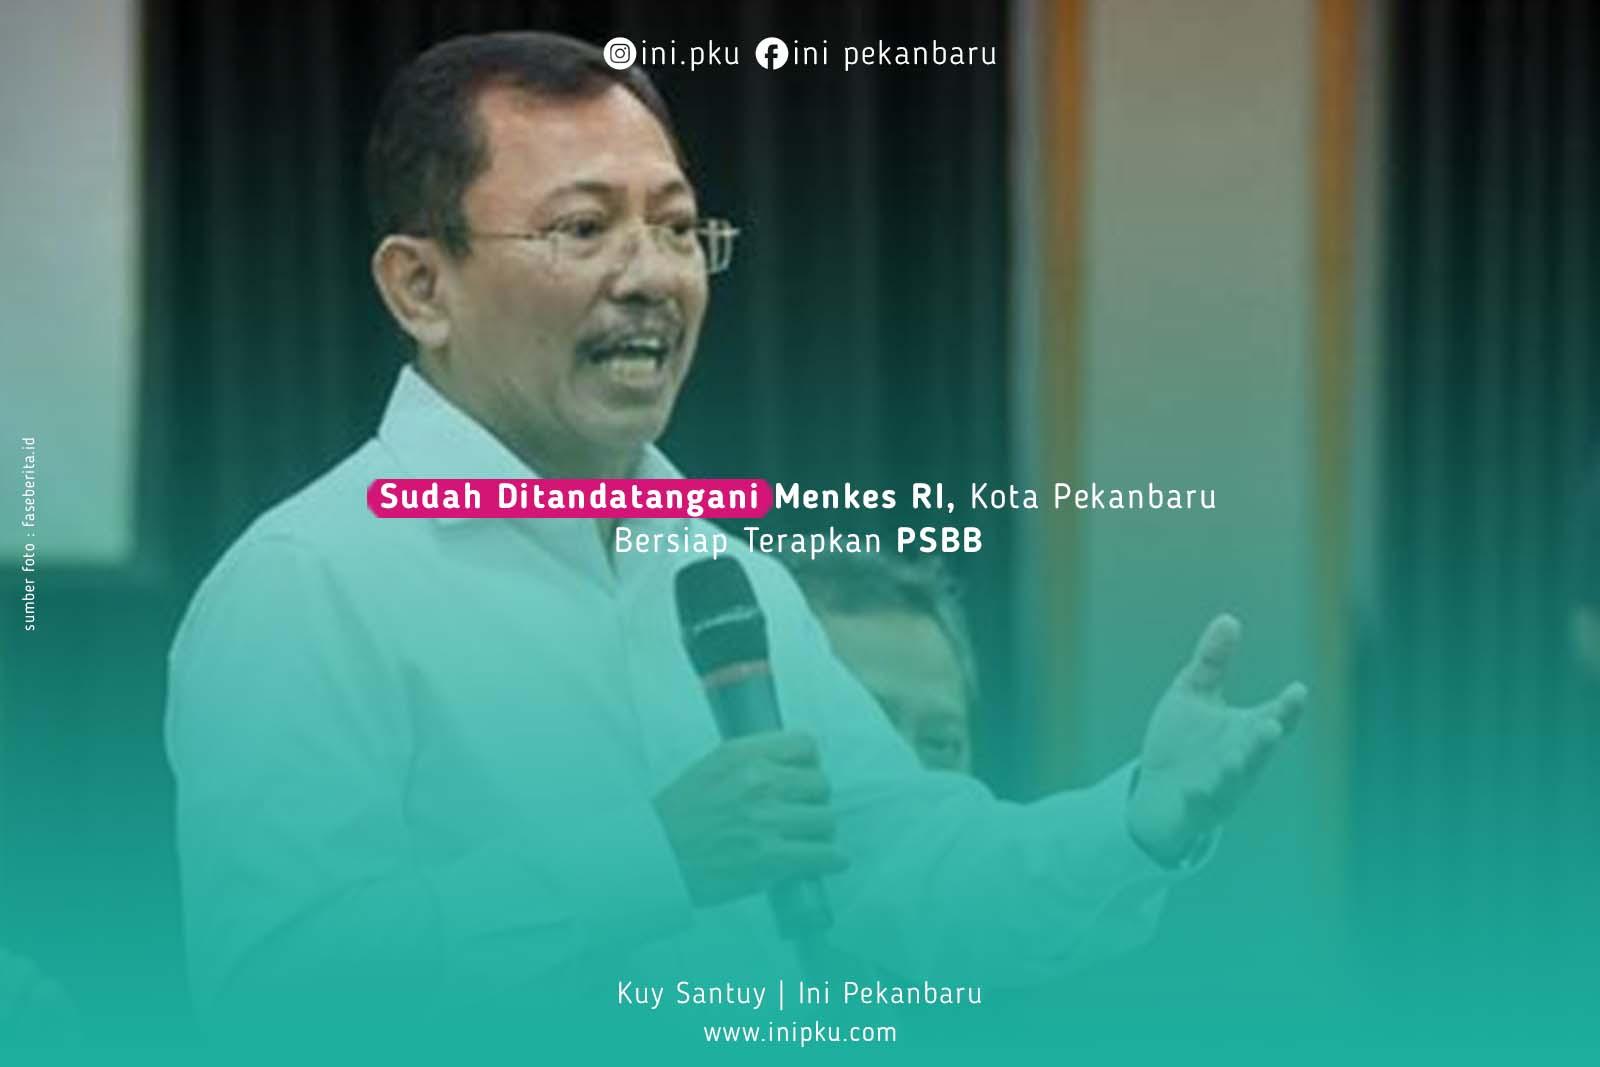 Sudah Ditandatangani Menkes RI, Kota Pekanbaru Bersiap Terapkan PSBB